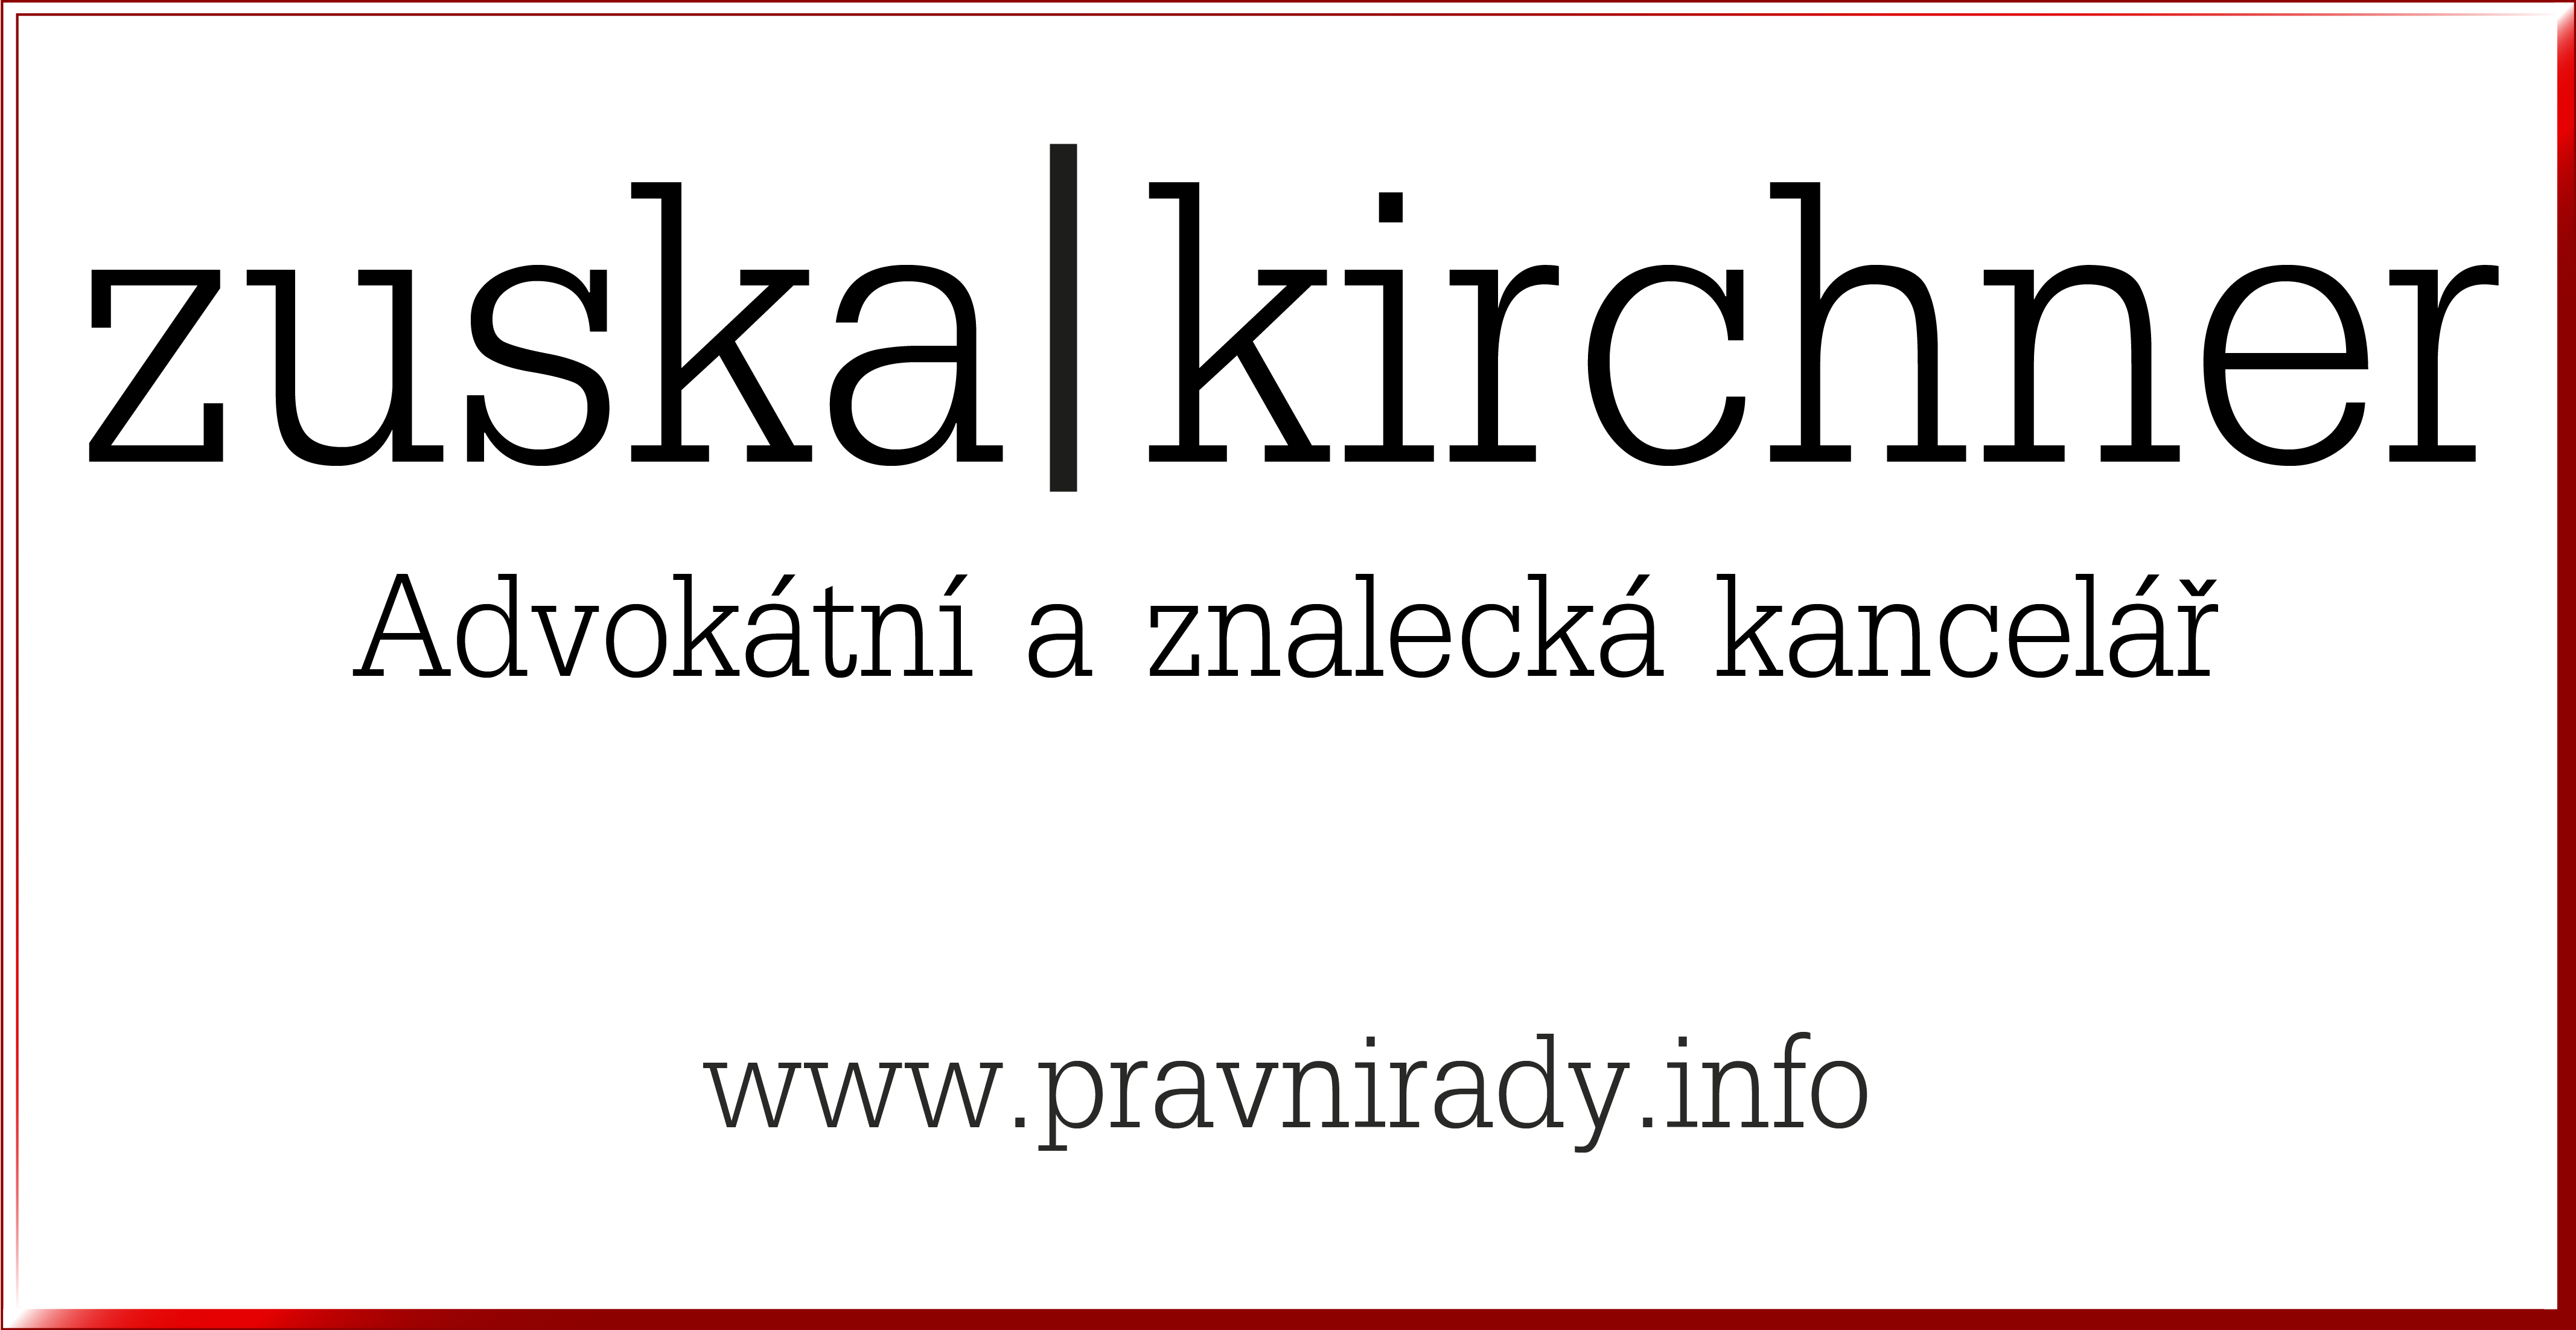 Zuska Kirchner logo